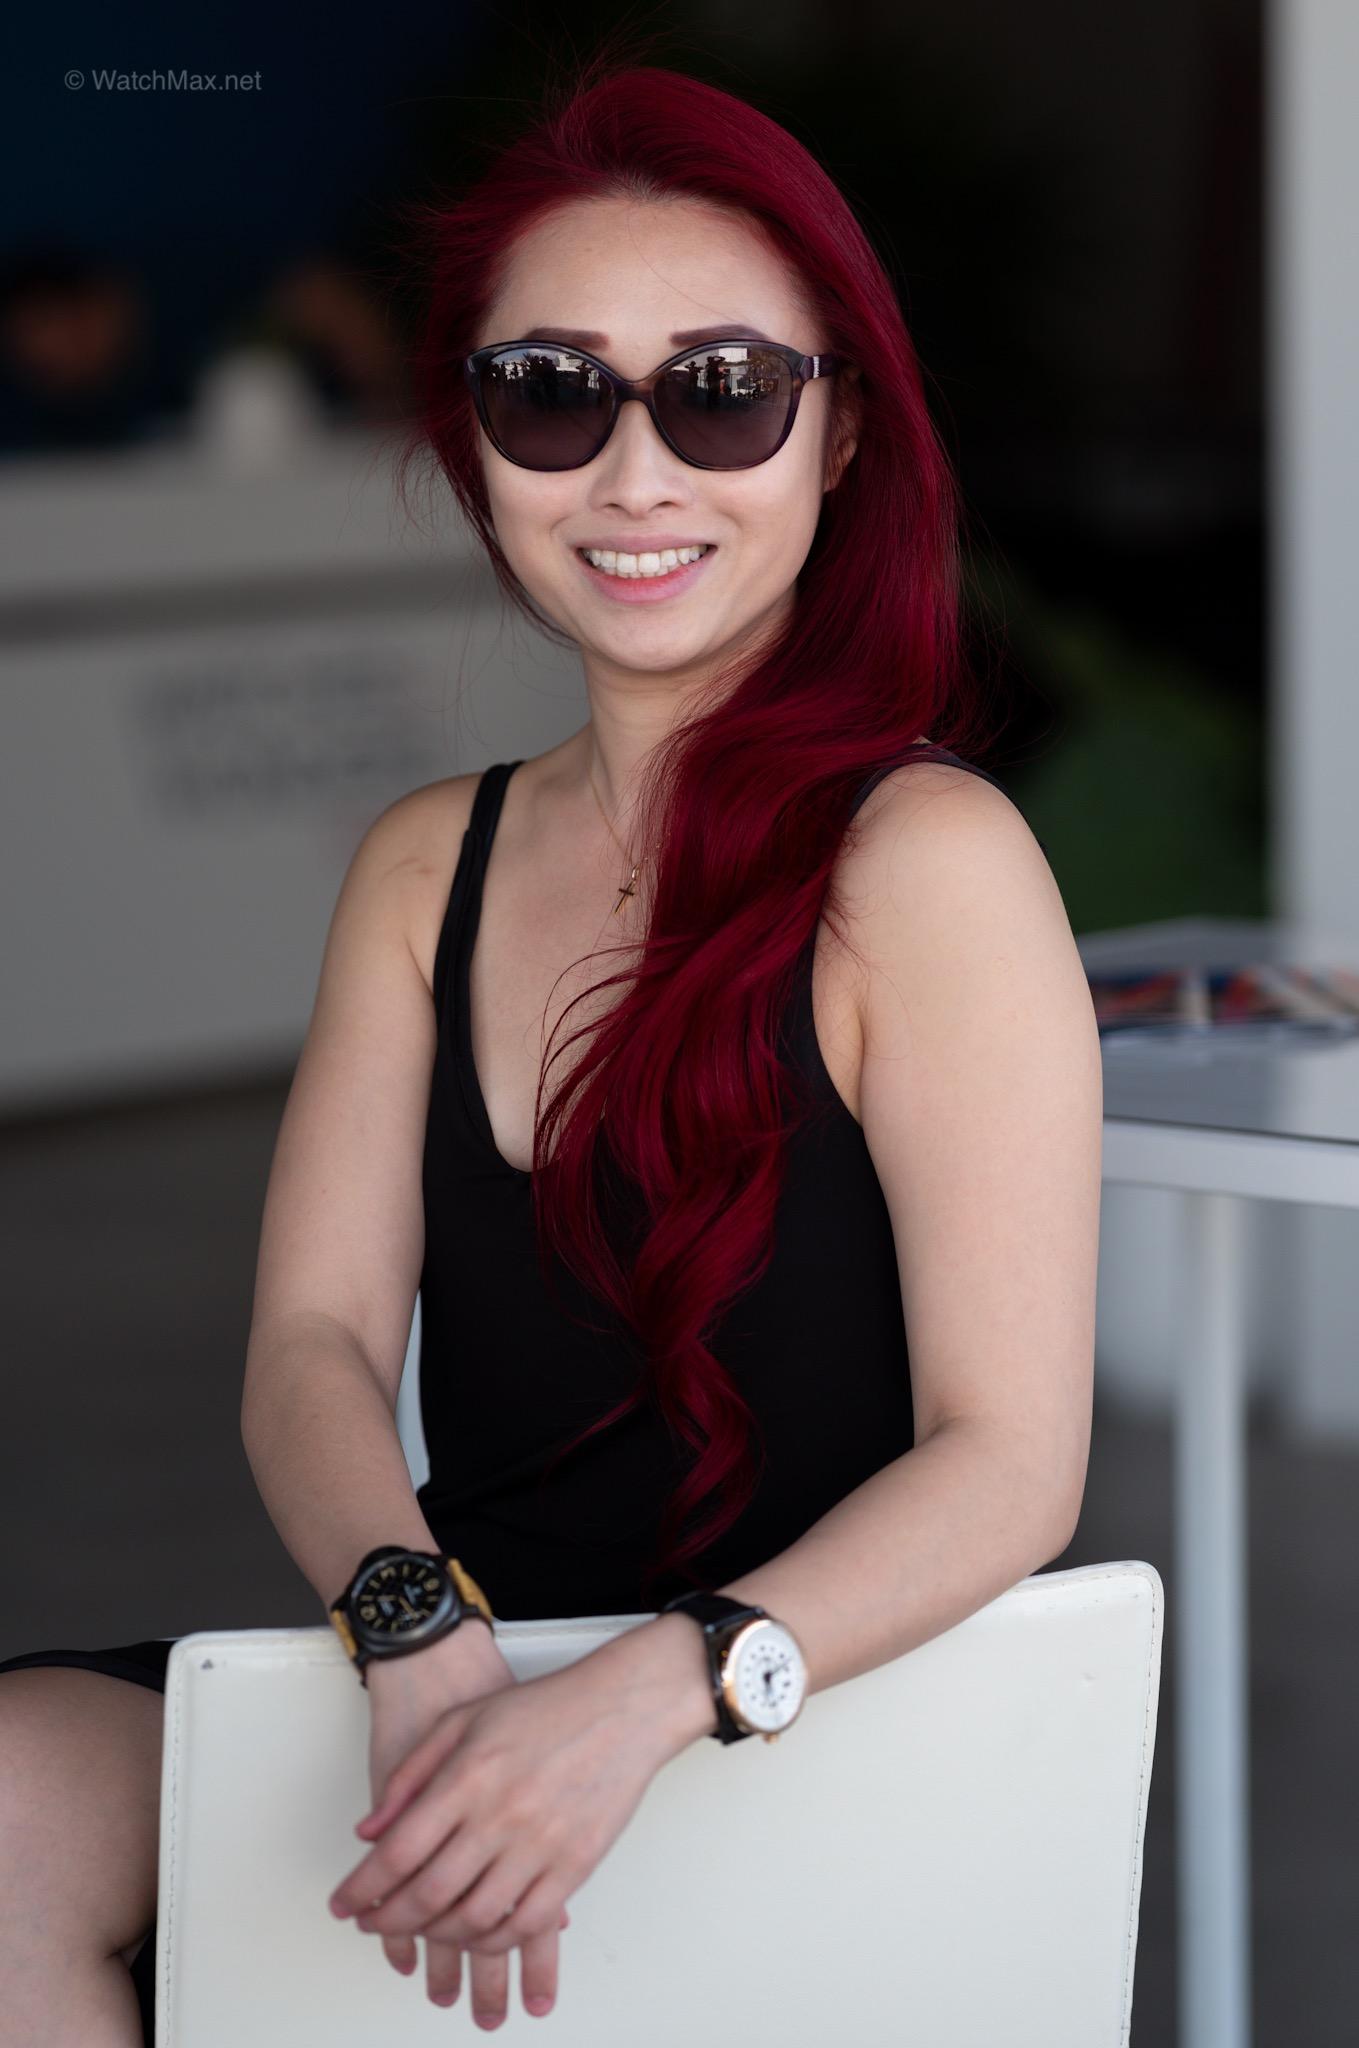 Suzanne Wong, Revolution Editor